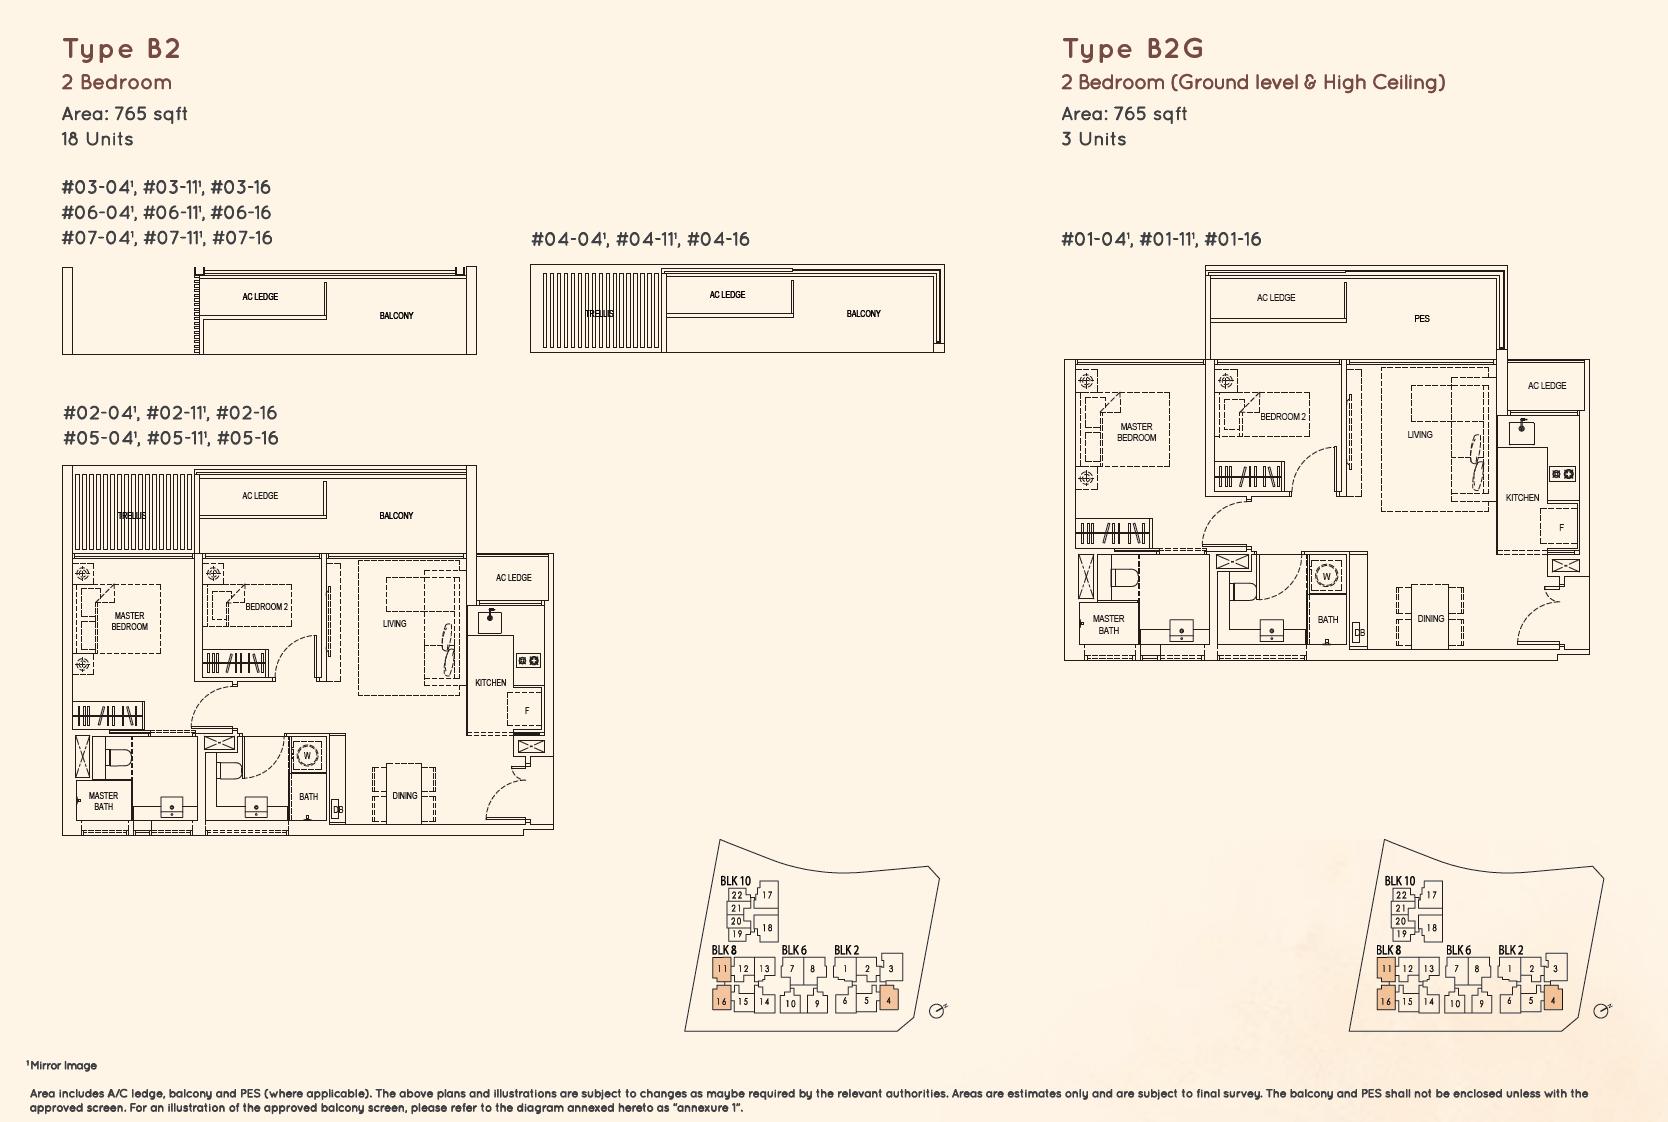 Kandis Residence 2 bedroom floor plan type B2